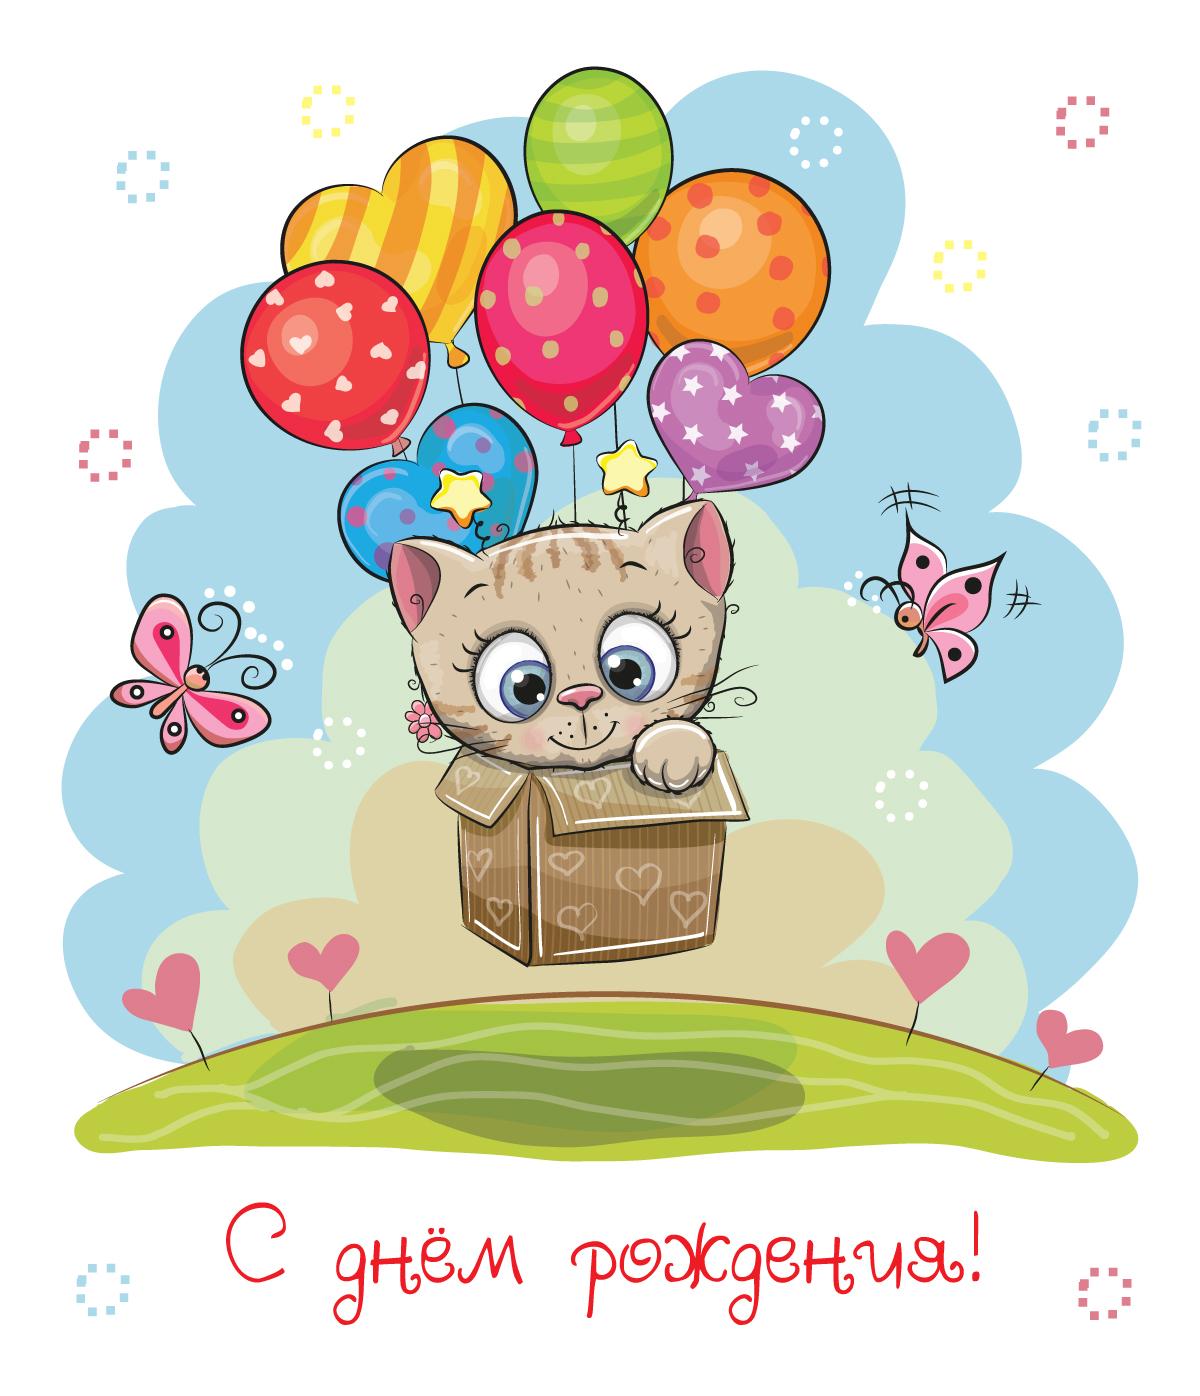 З днем народження открытка для детей